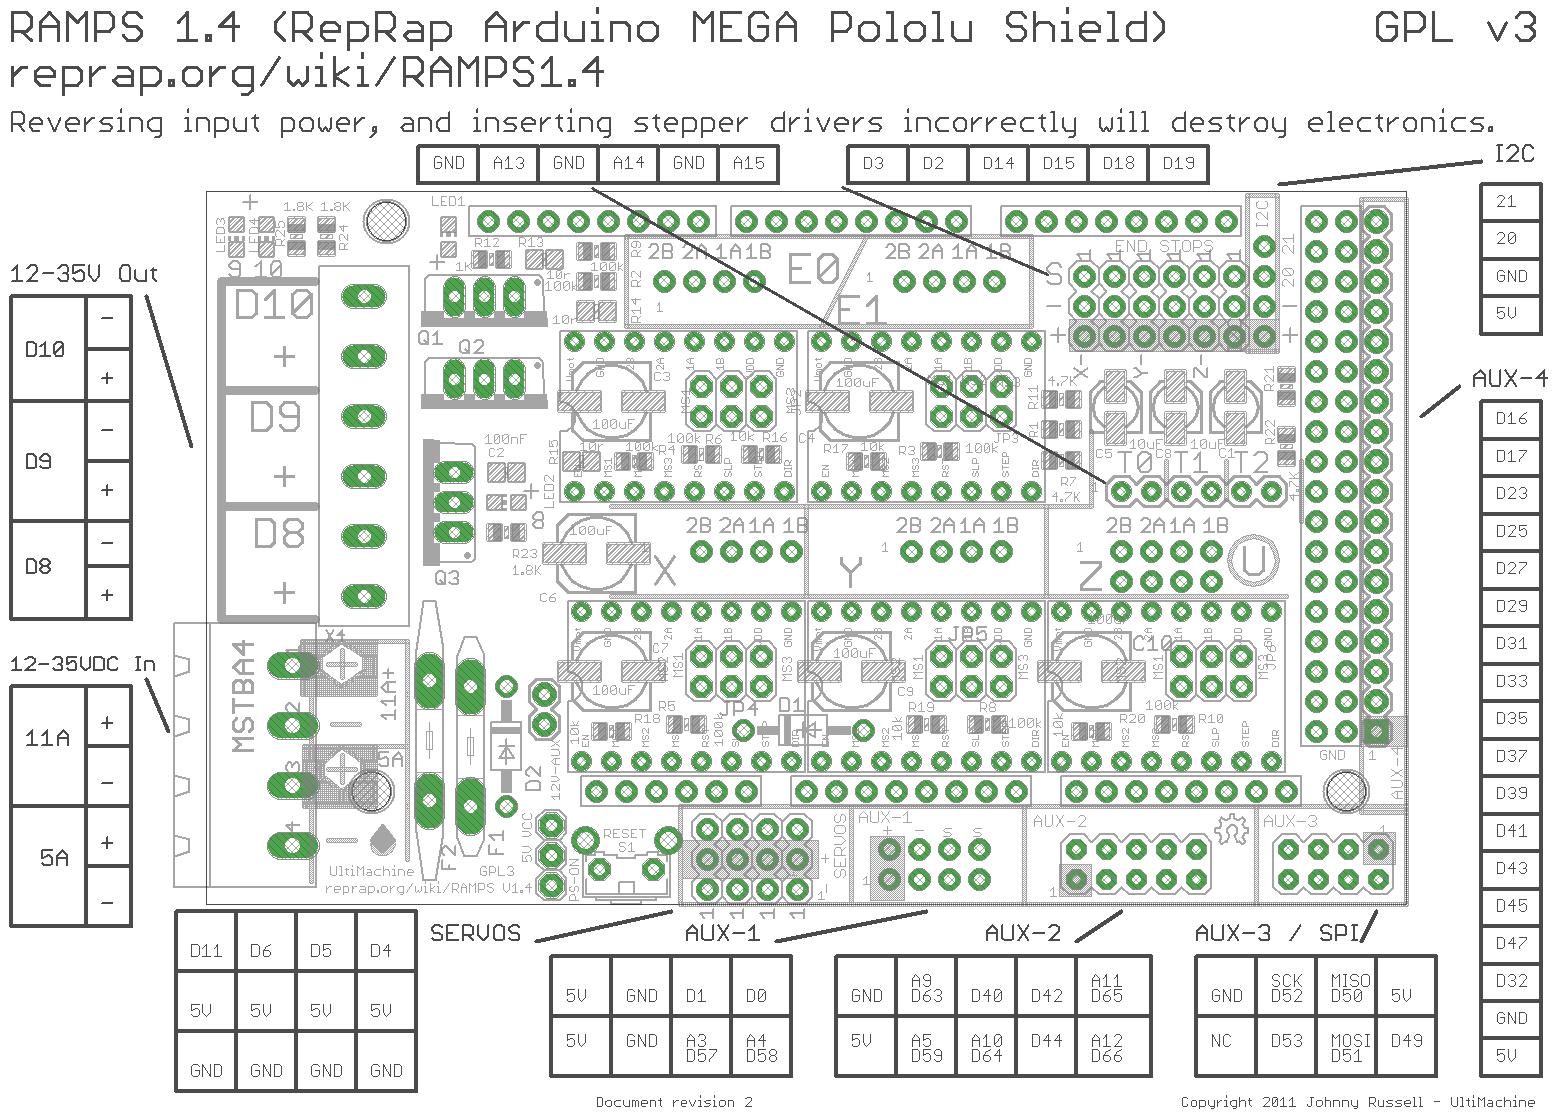 reprap wiring diagram zenith updraft carburetor ramps1 4 3d printer circuit connection graph